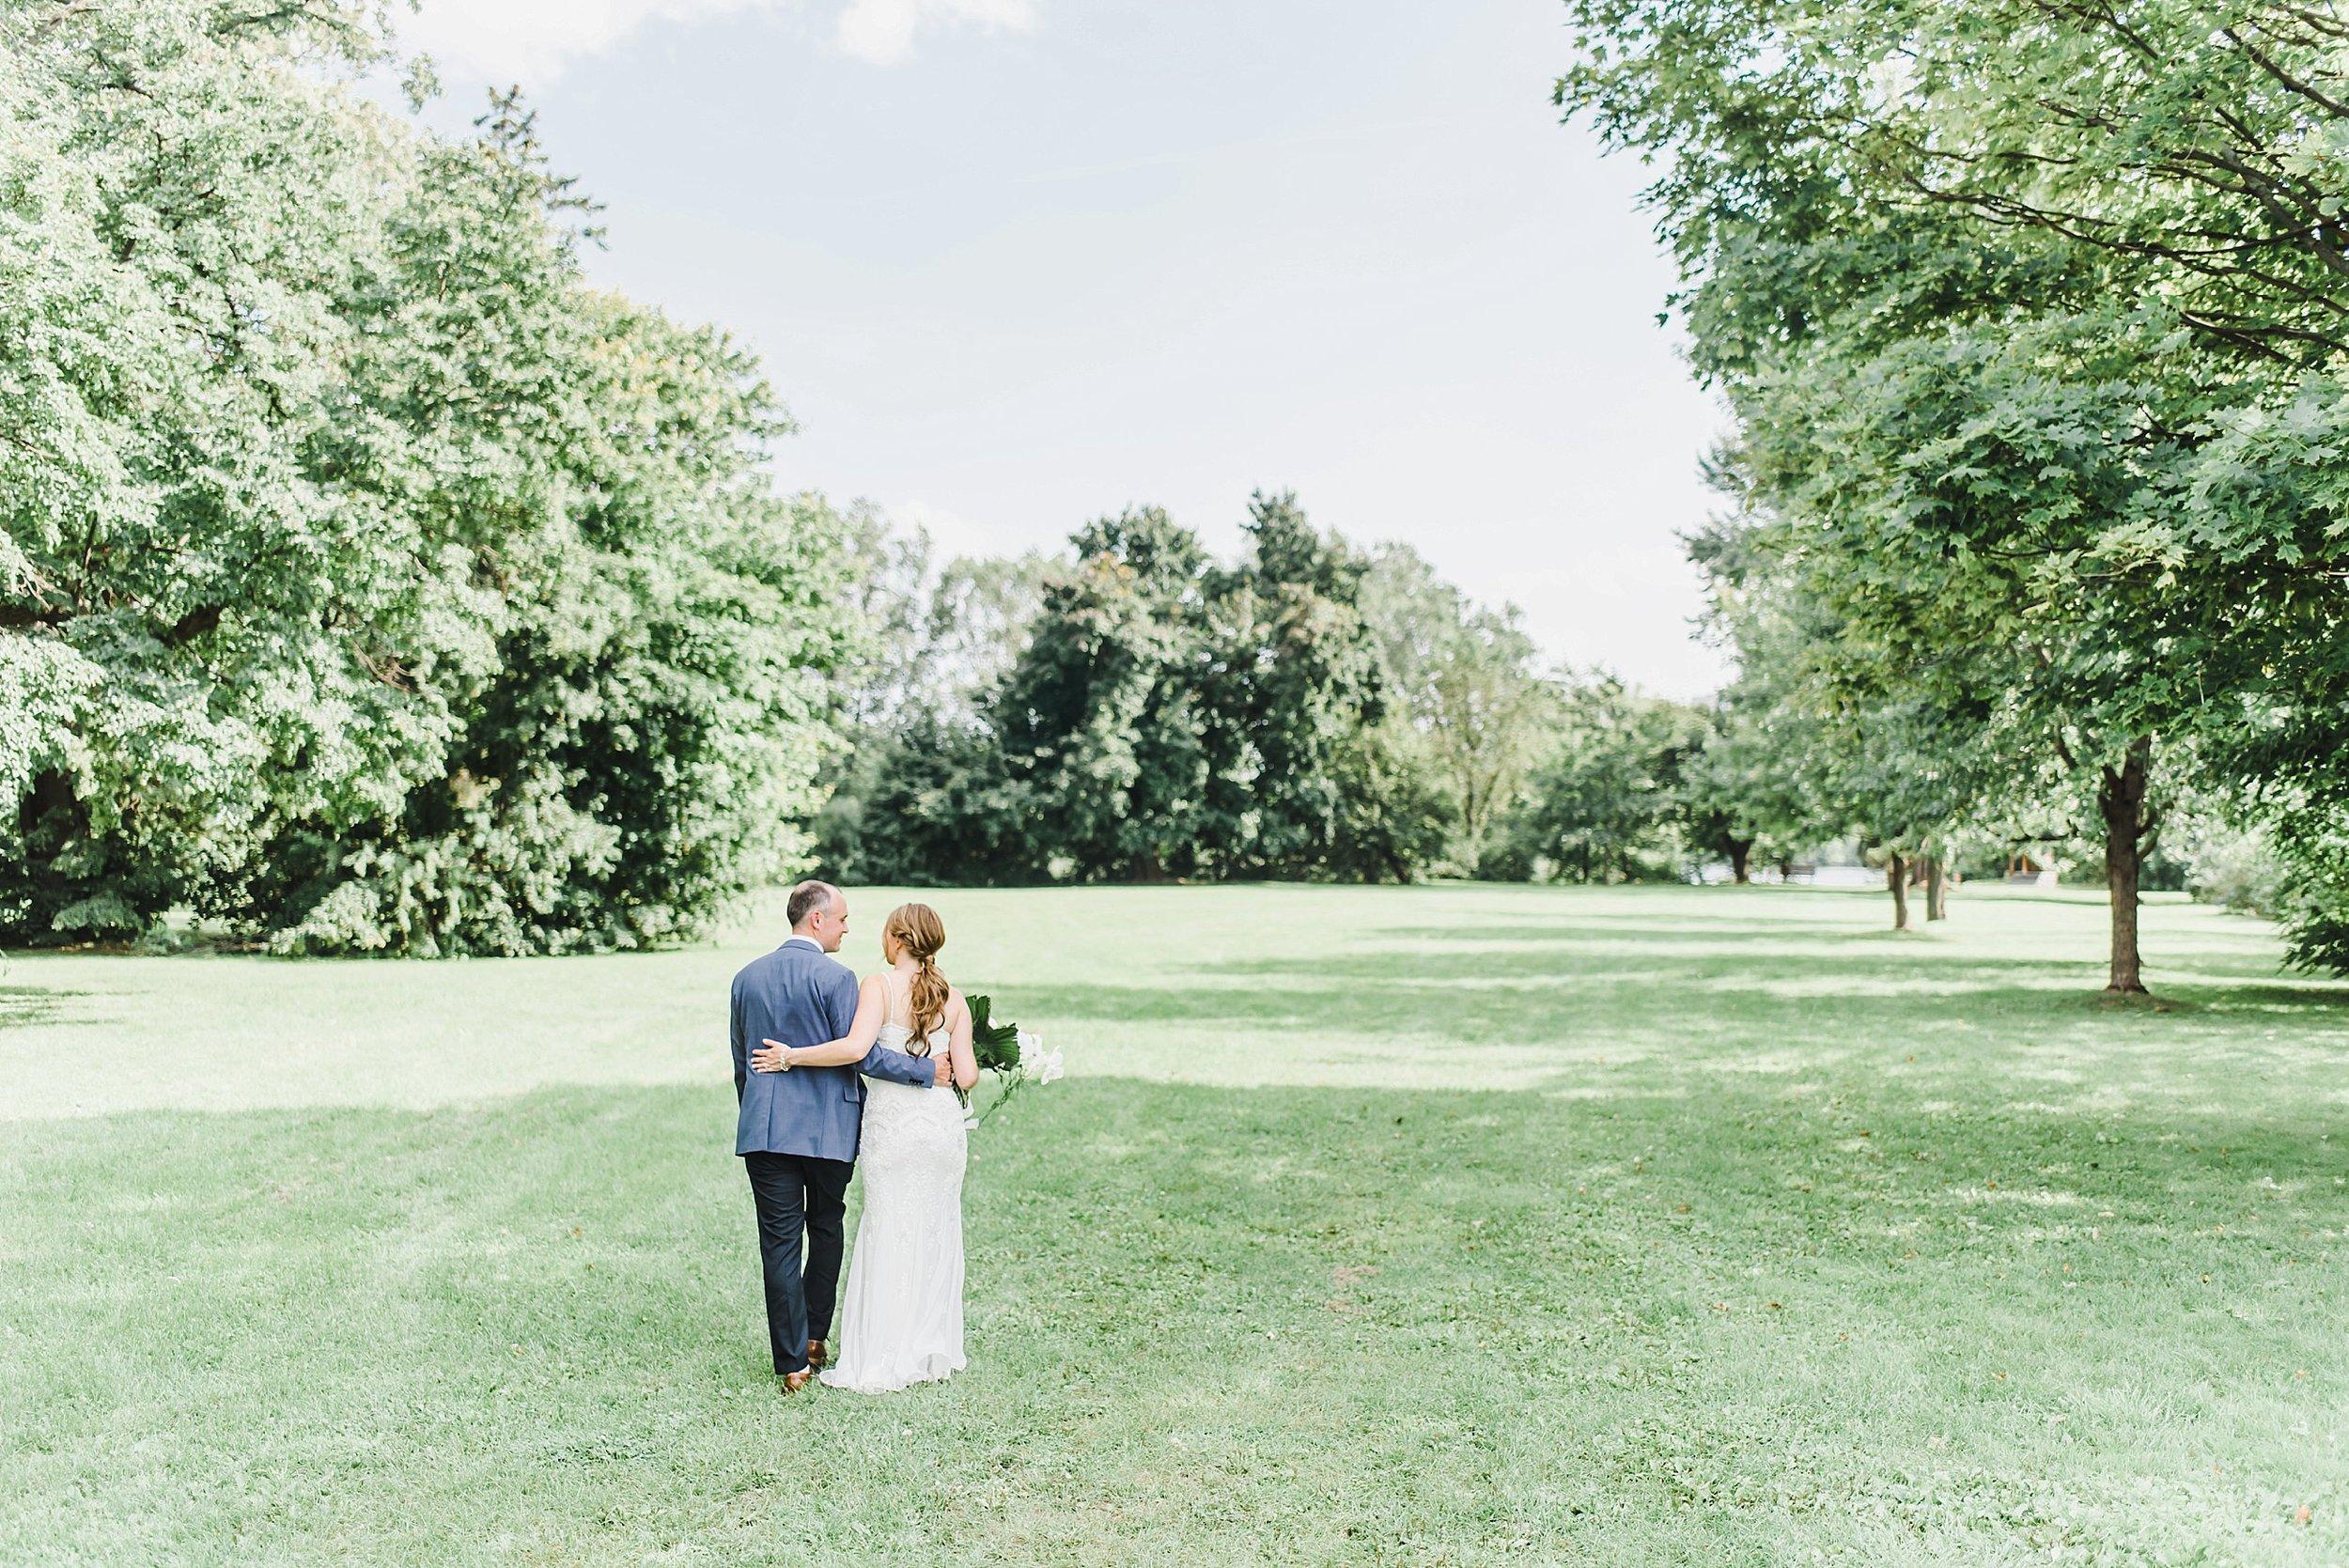 light airy indie fine art ottawa wedding photographer | Ali and Batoul Photography_0654.jpg